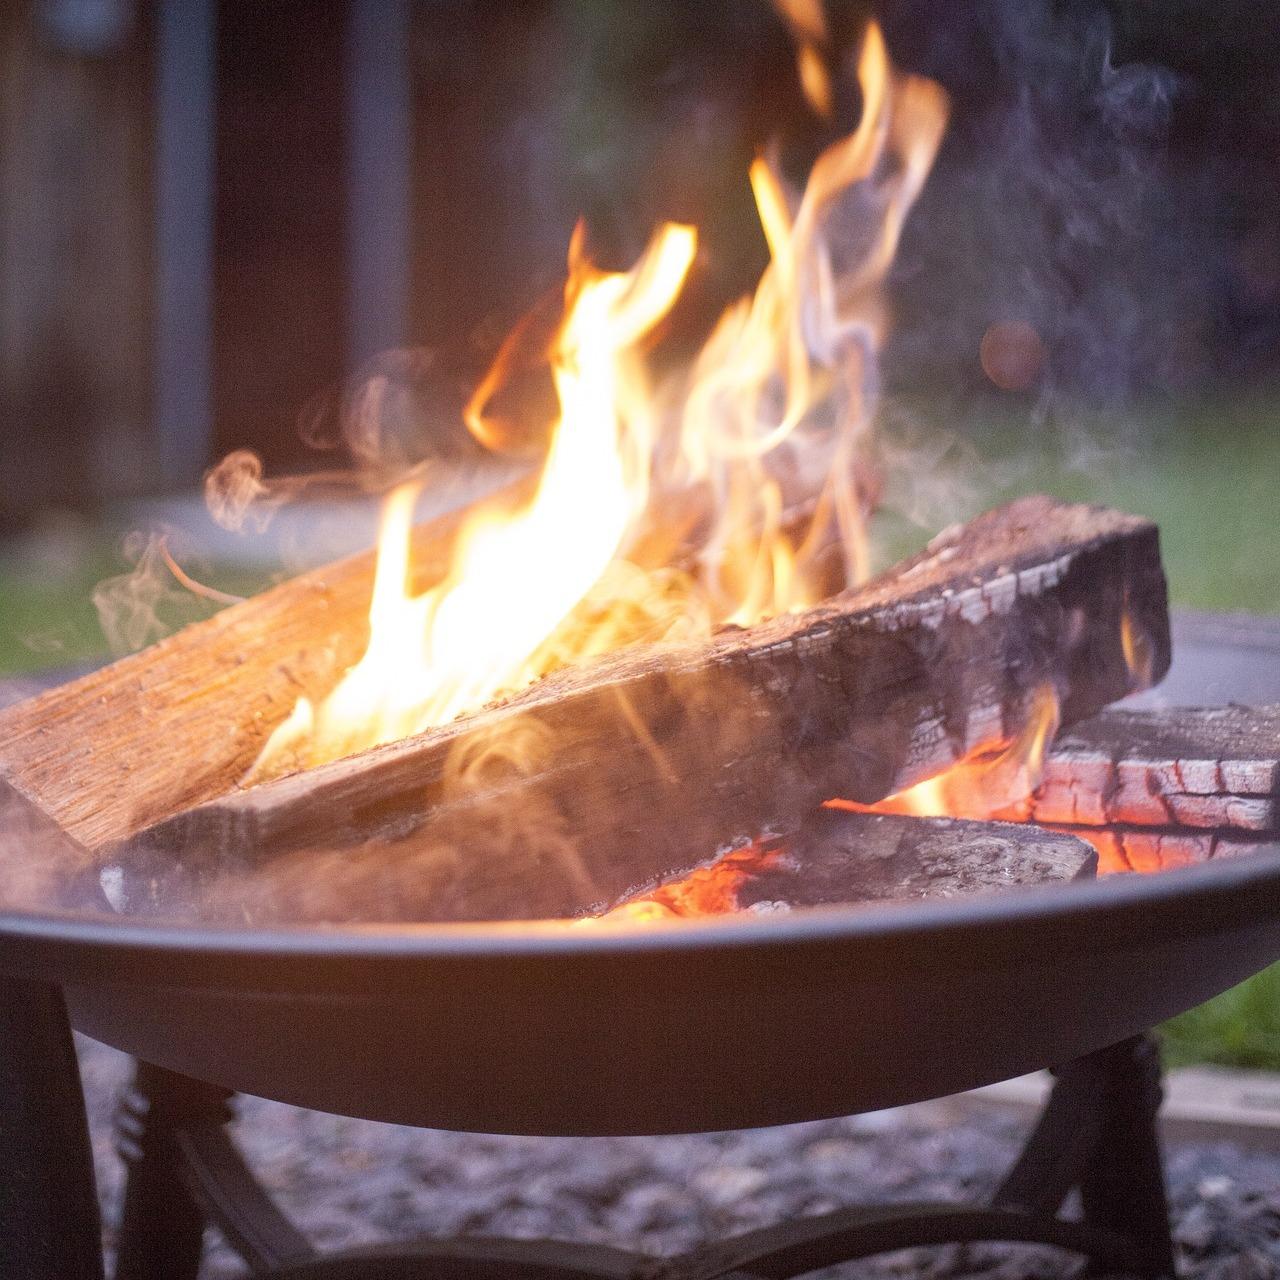 Fire Pit Photo - East Grand Rapids, MI - Official Website